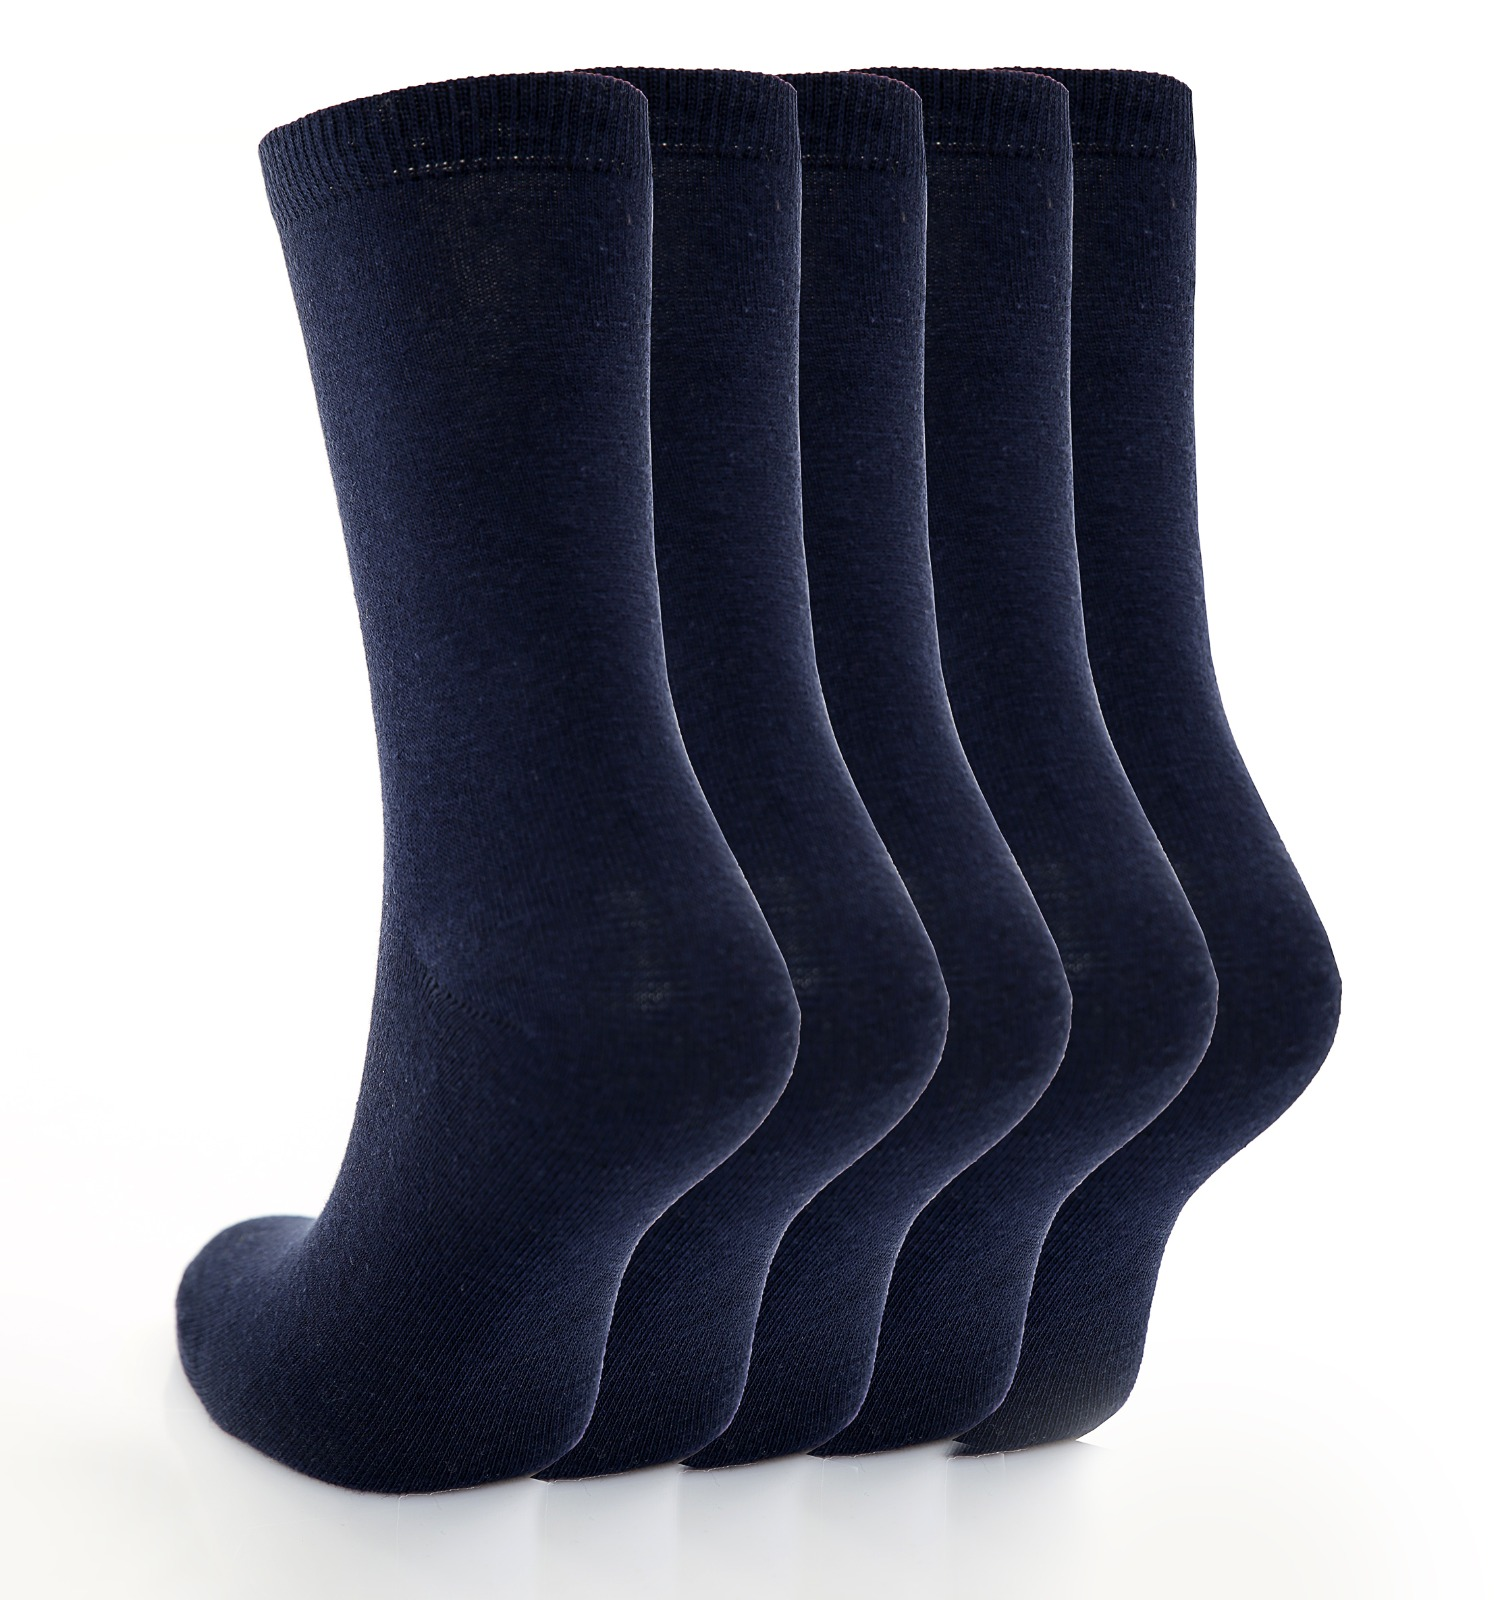 Children's 5pk Plain Navy Cotton Rich Socks